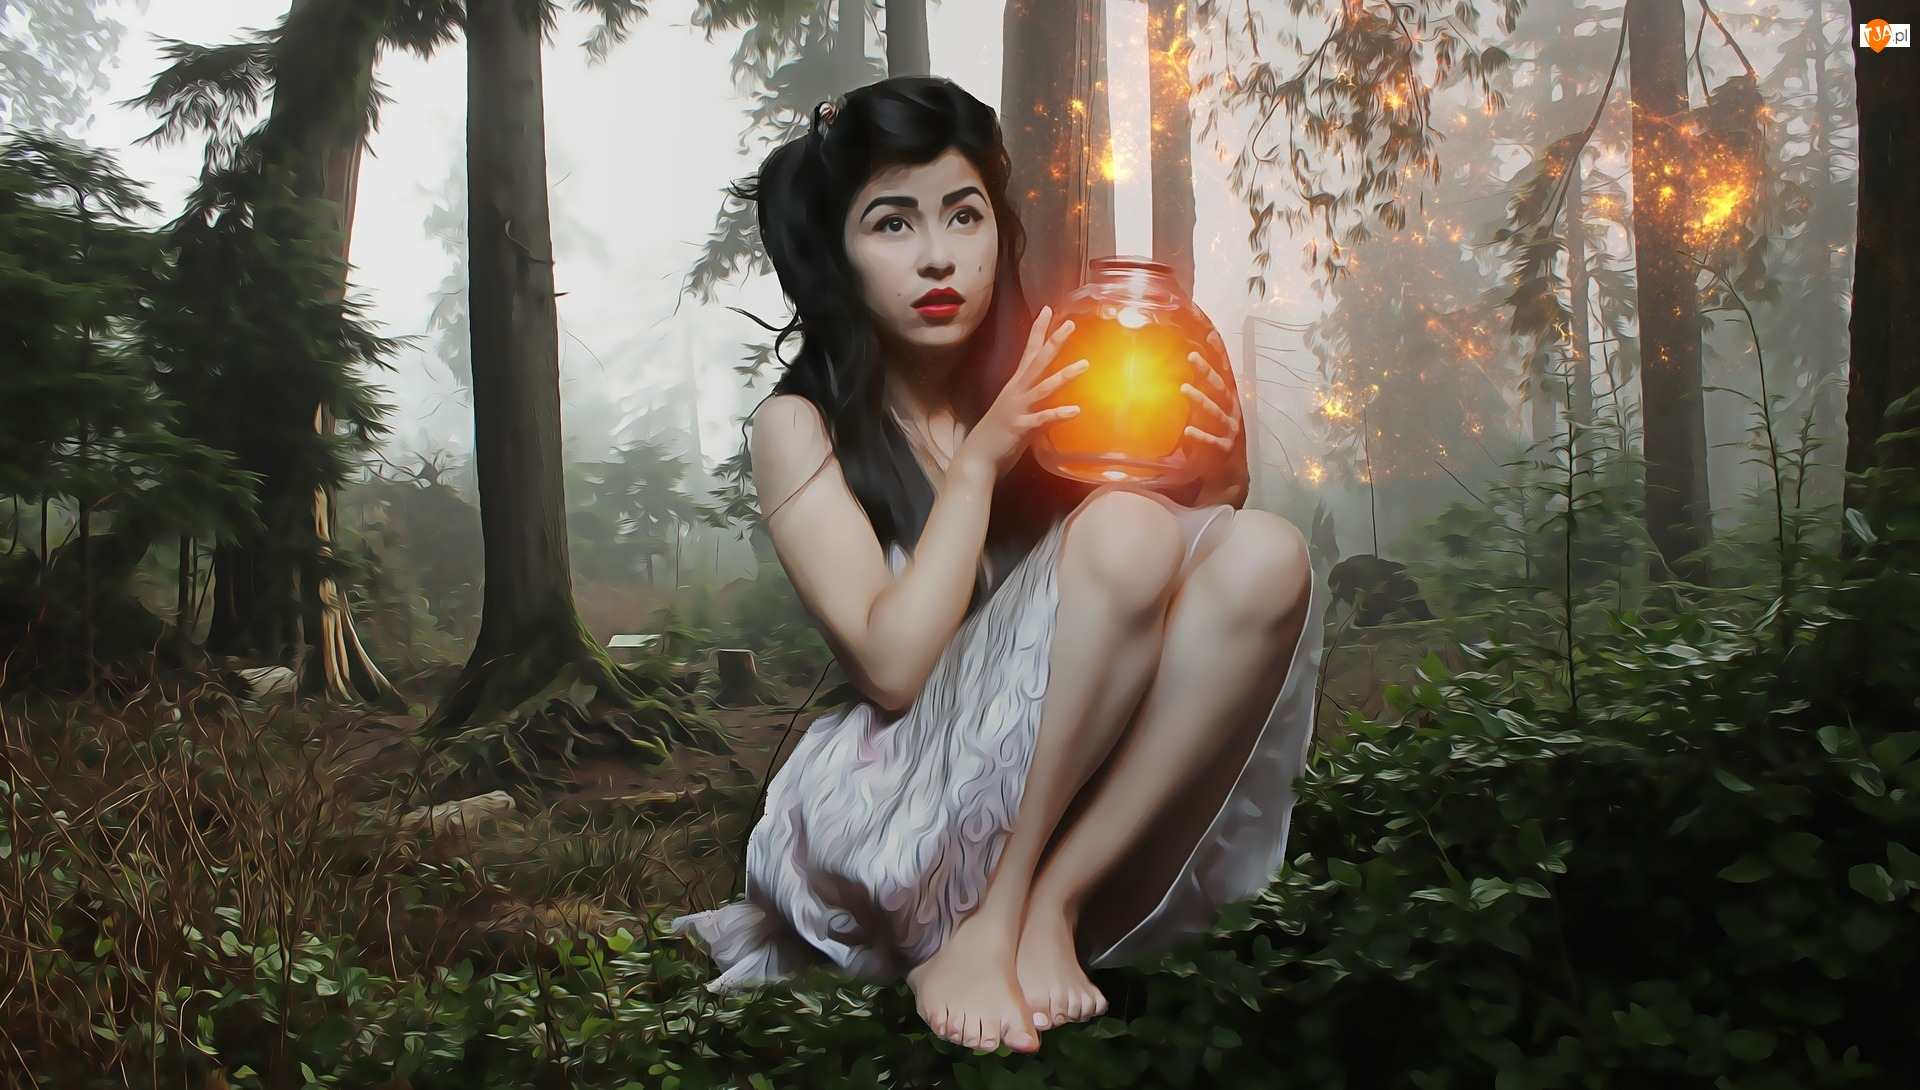 Światło, Kobieta, Las